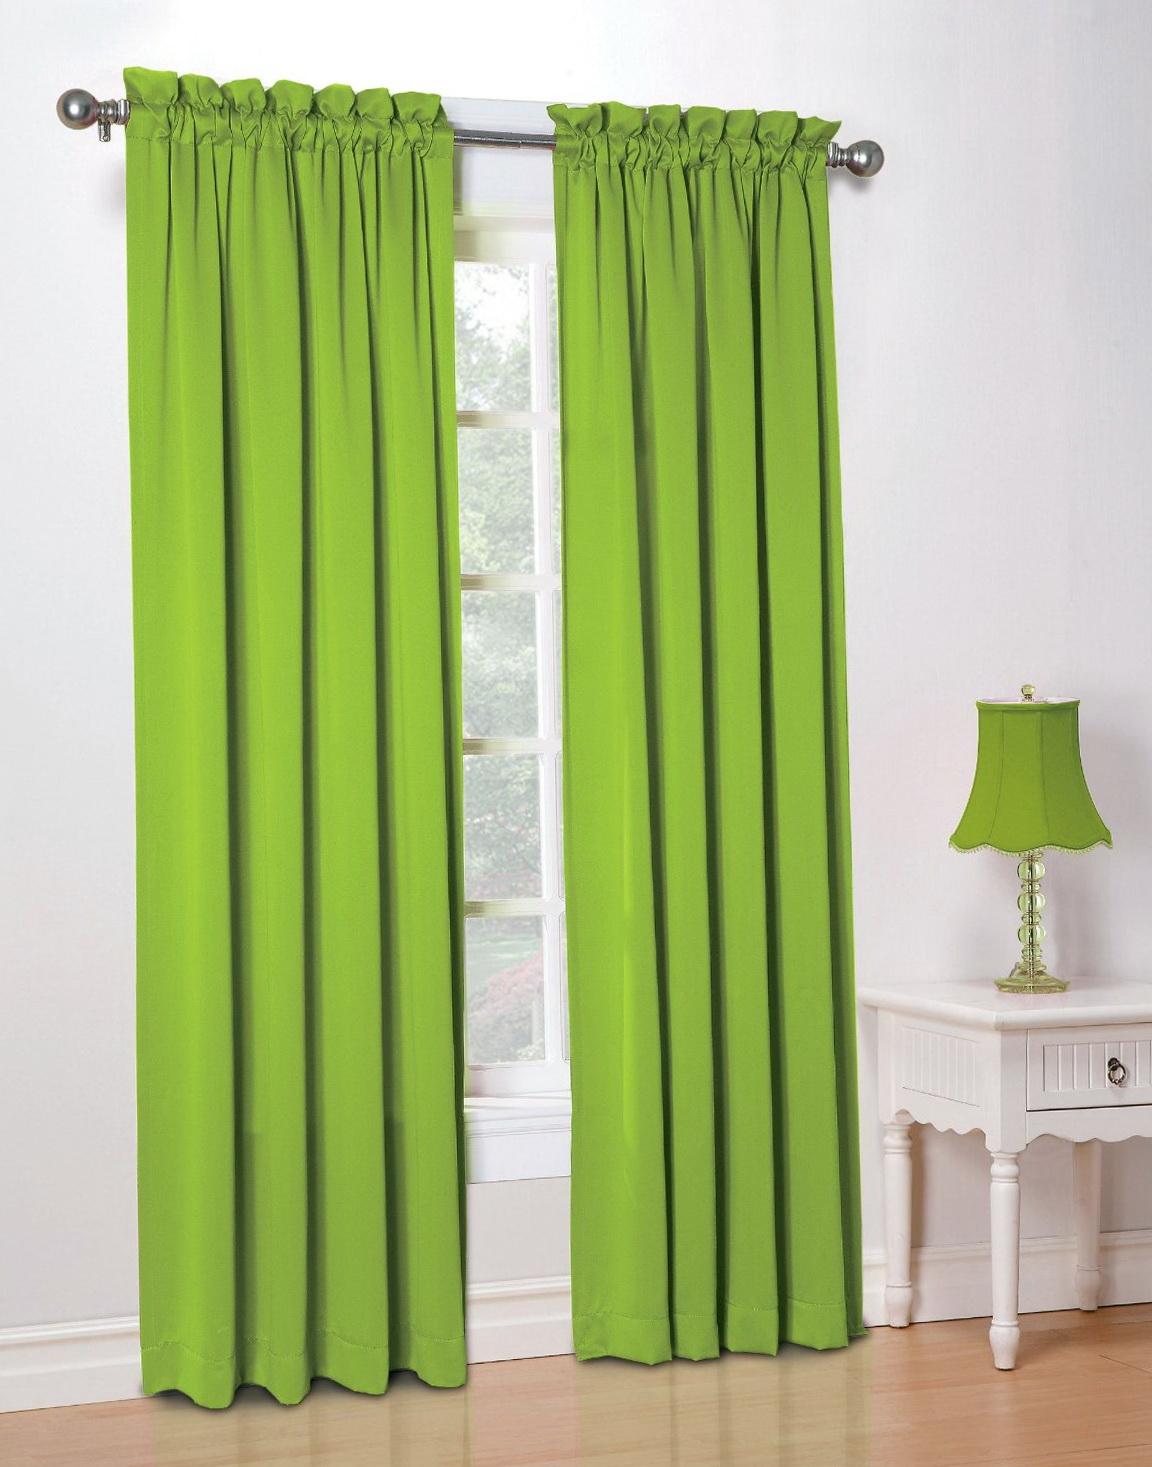 Lime Green Curtain Panels Home Design Ideas